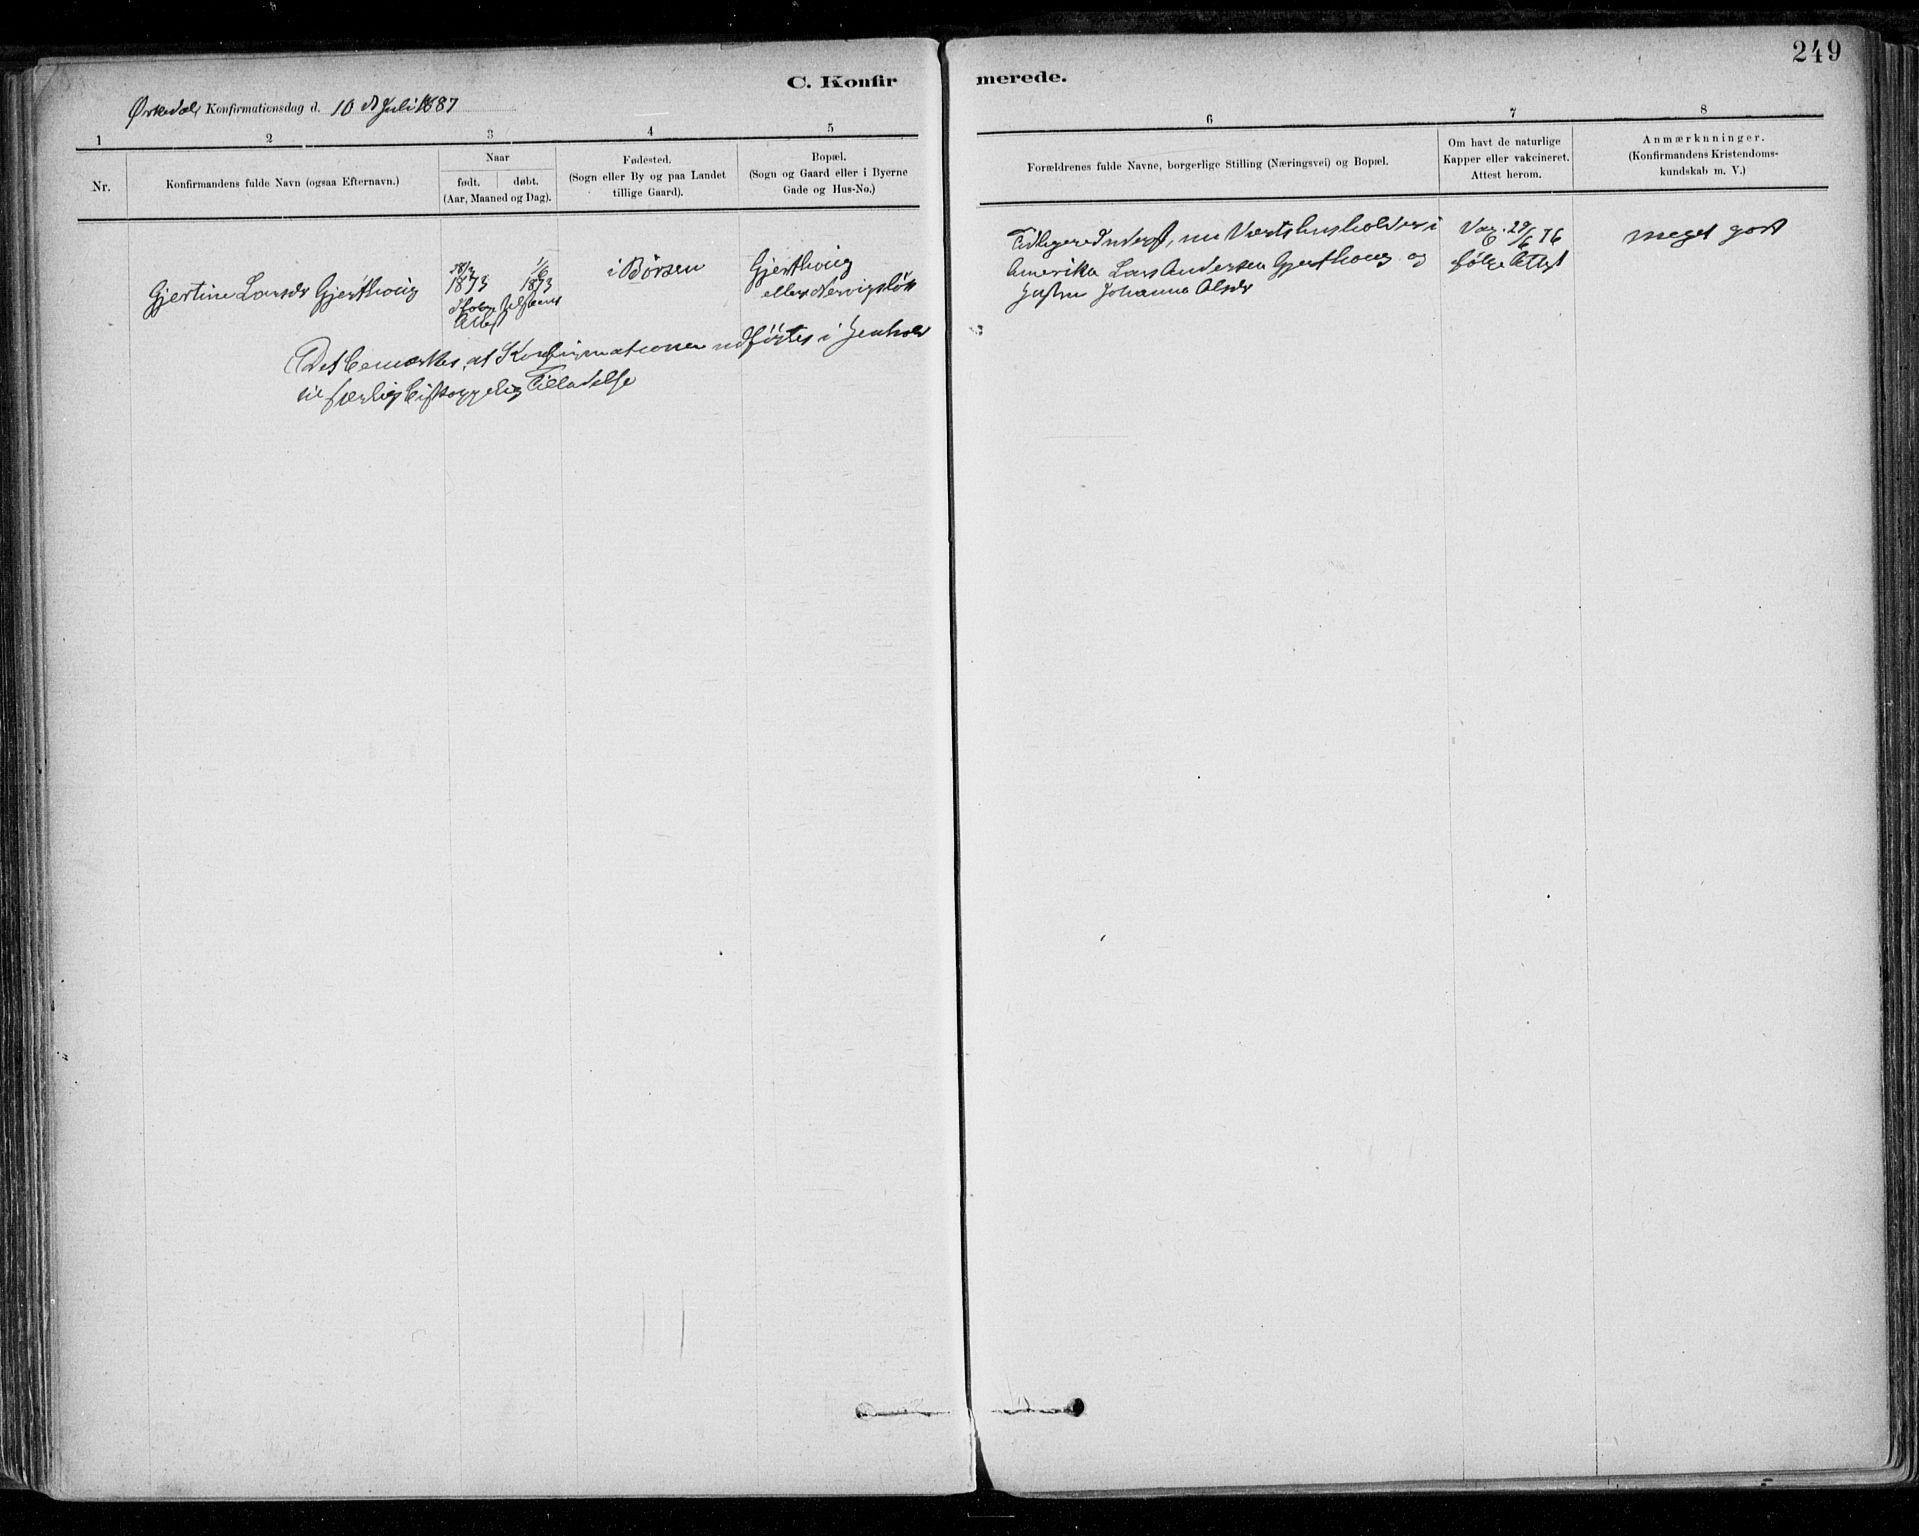 SAT, Ministerialprotokoller, klokkerbøker og fødselsregistre - Sør-Trøndelag, 668/L0809: Parish register (official) no. 668A09, 1881-1895, p. 249